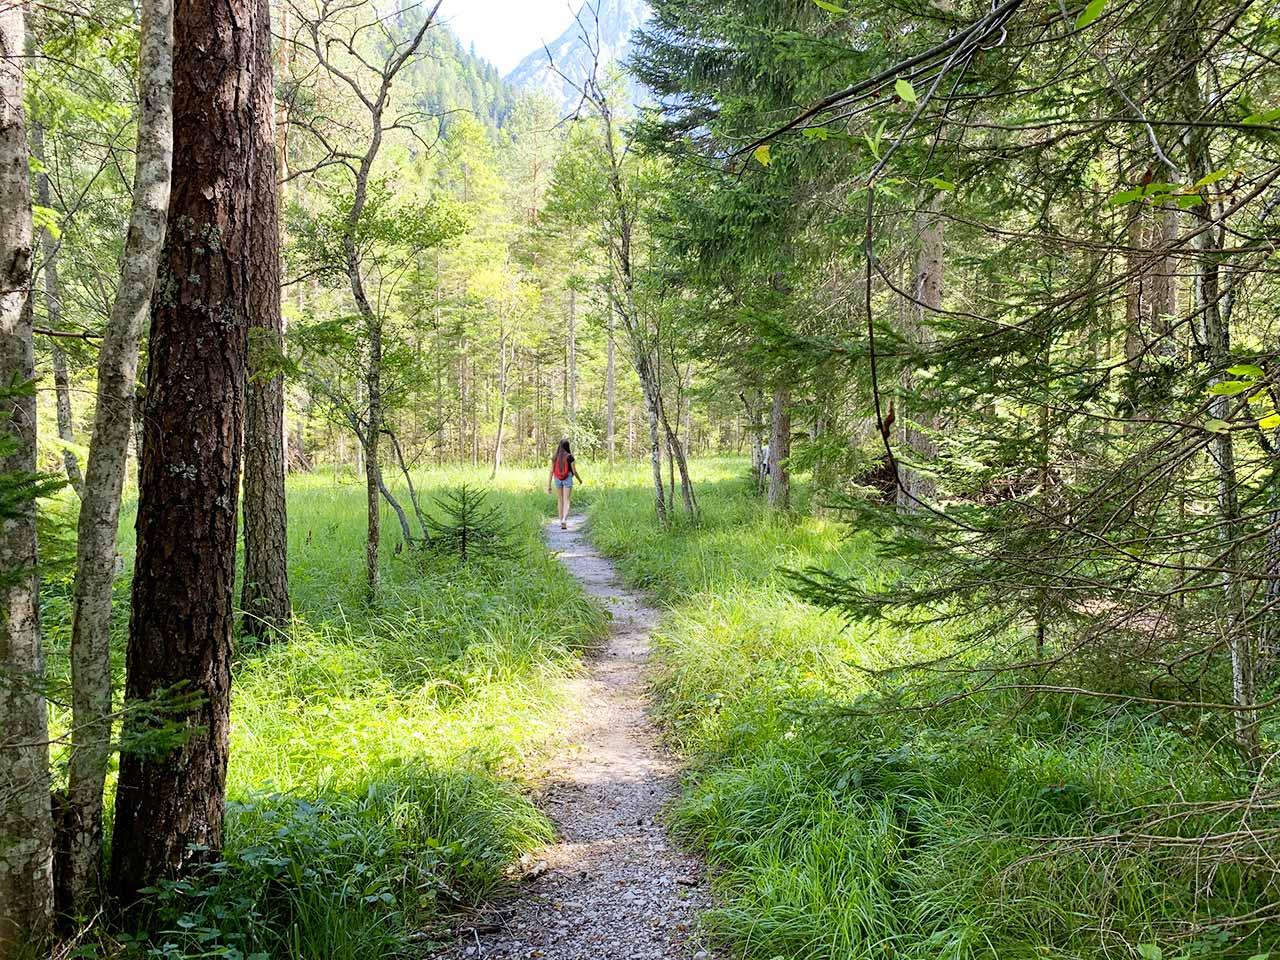 Pralongo - Auronzo passeggiata verso torrente Ansei